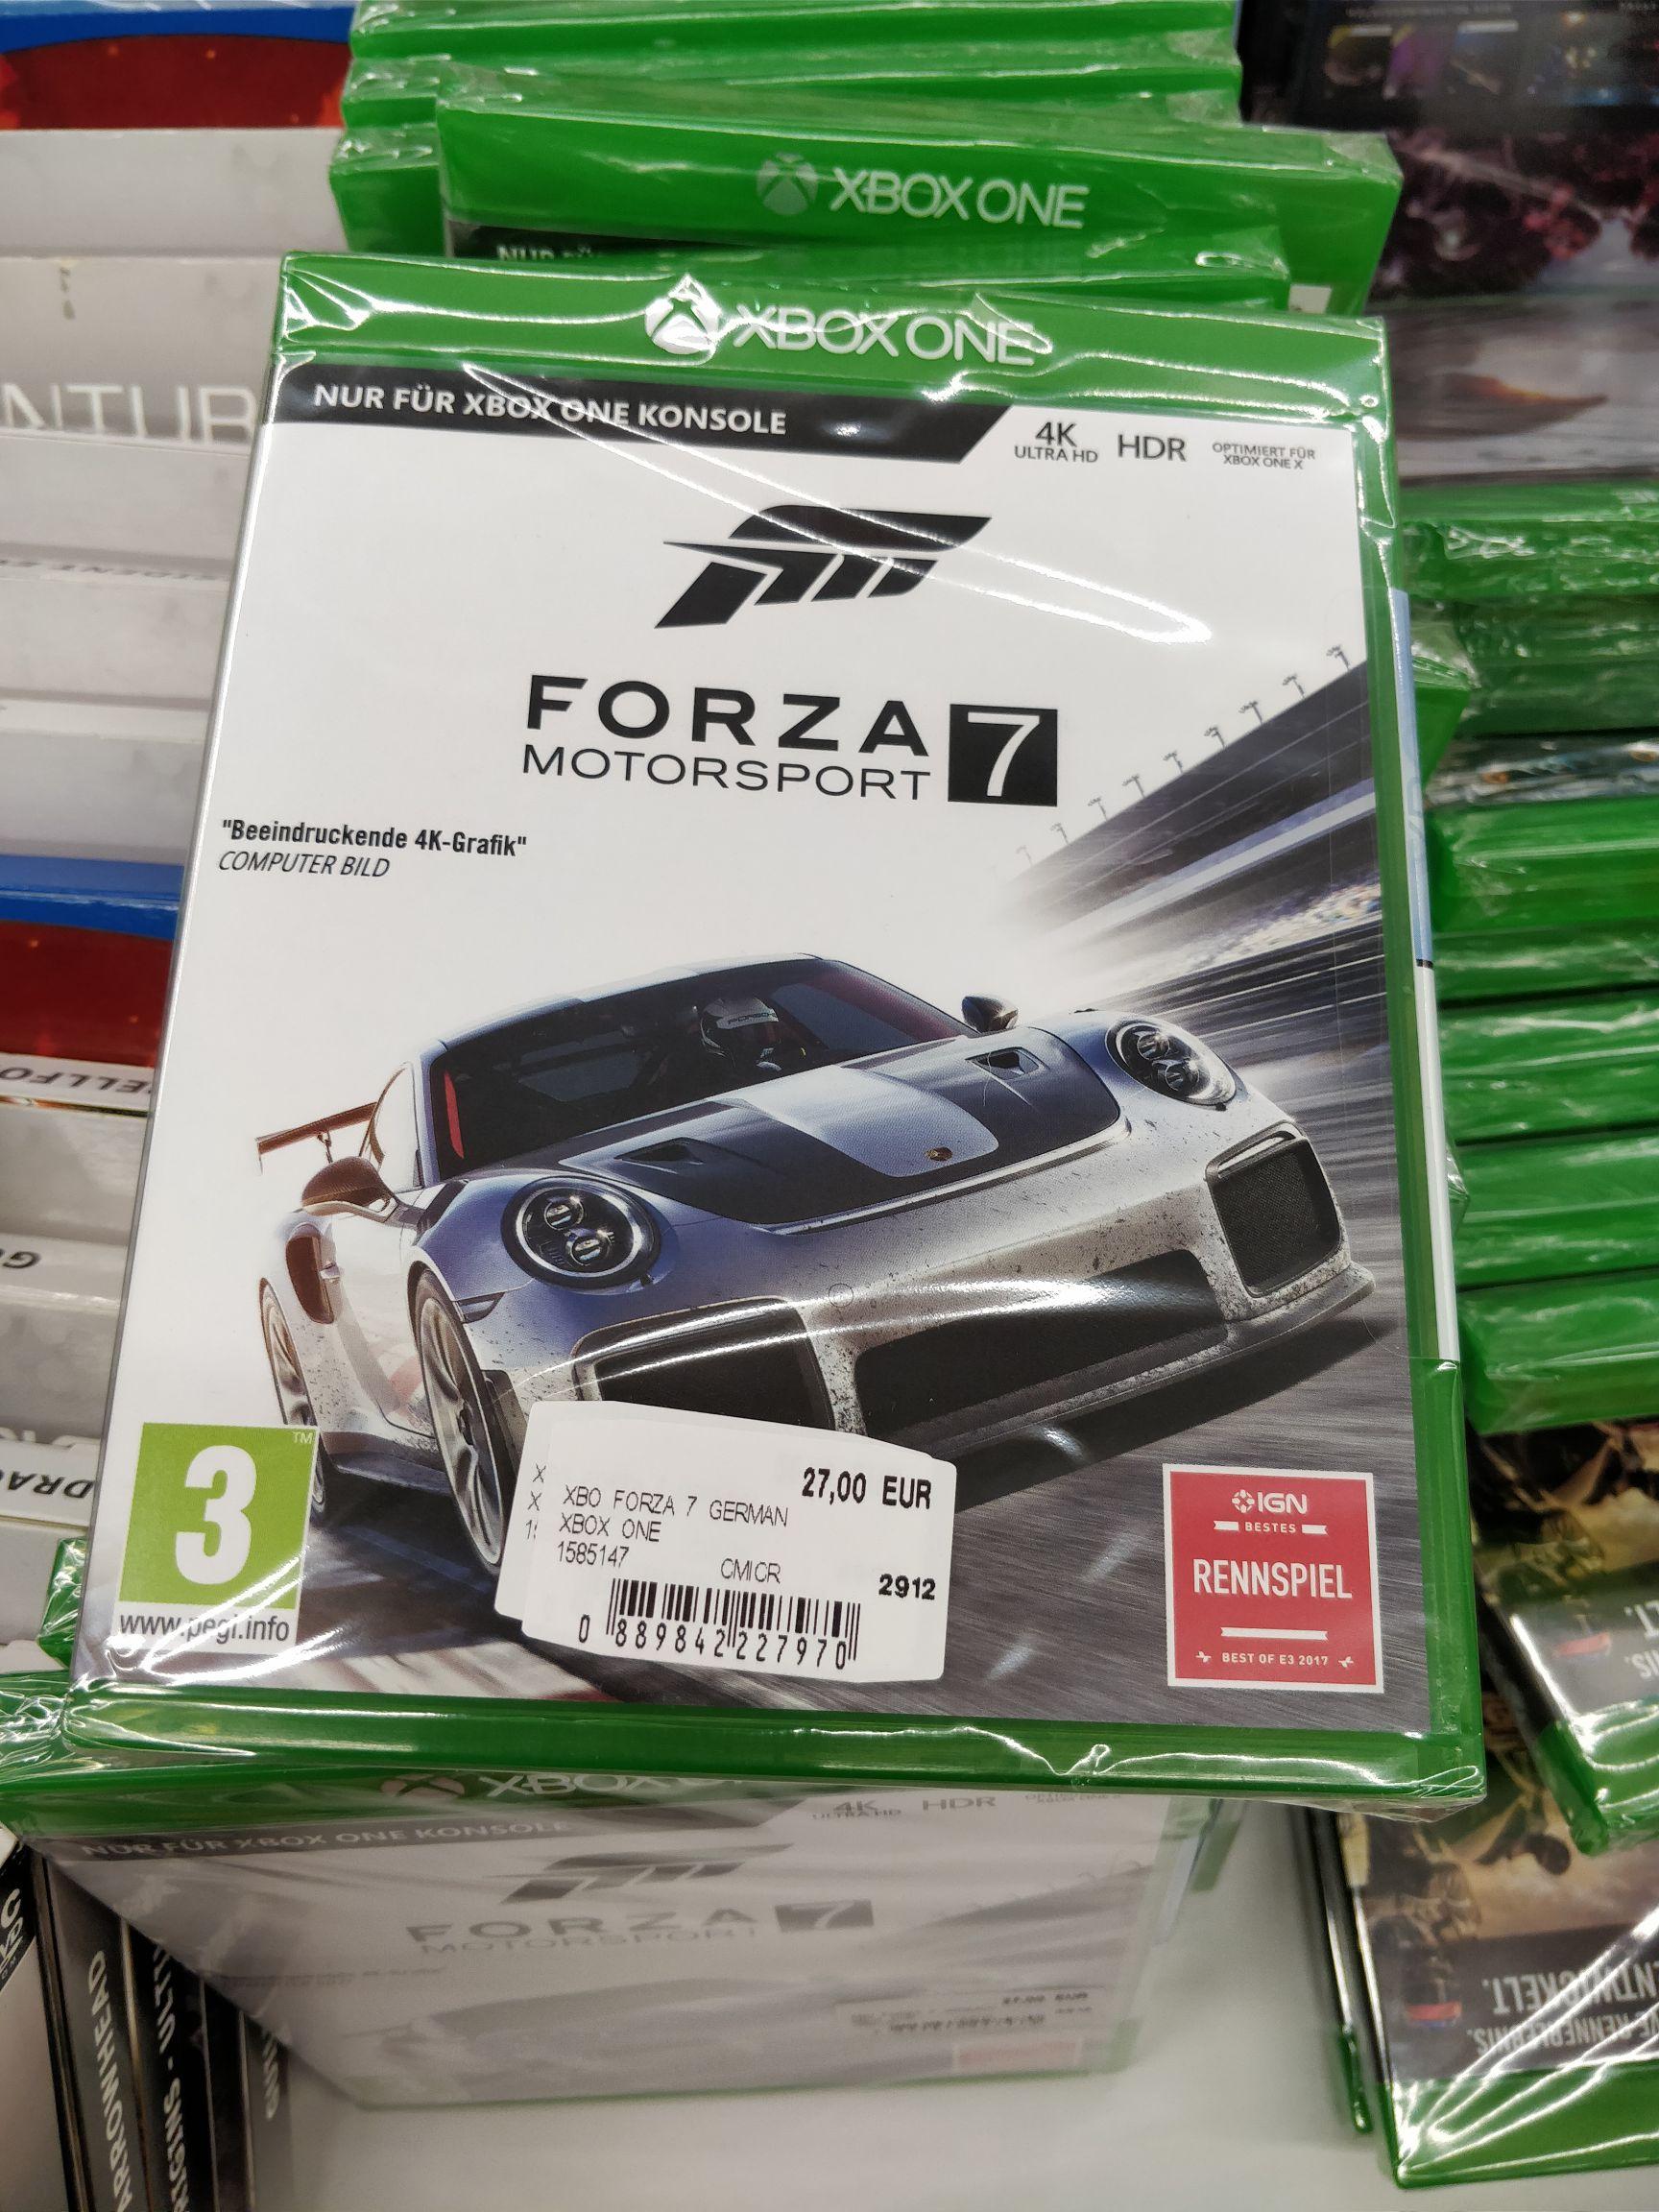 [MM Hietzing] Forza 7, 6 und Horizon 2 XBOX One